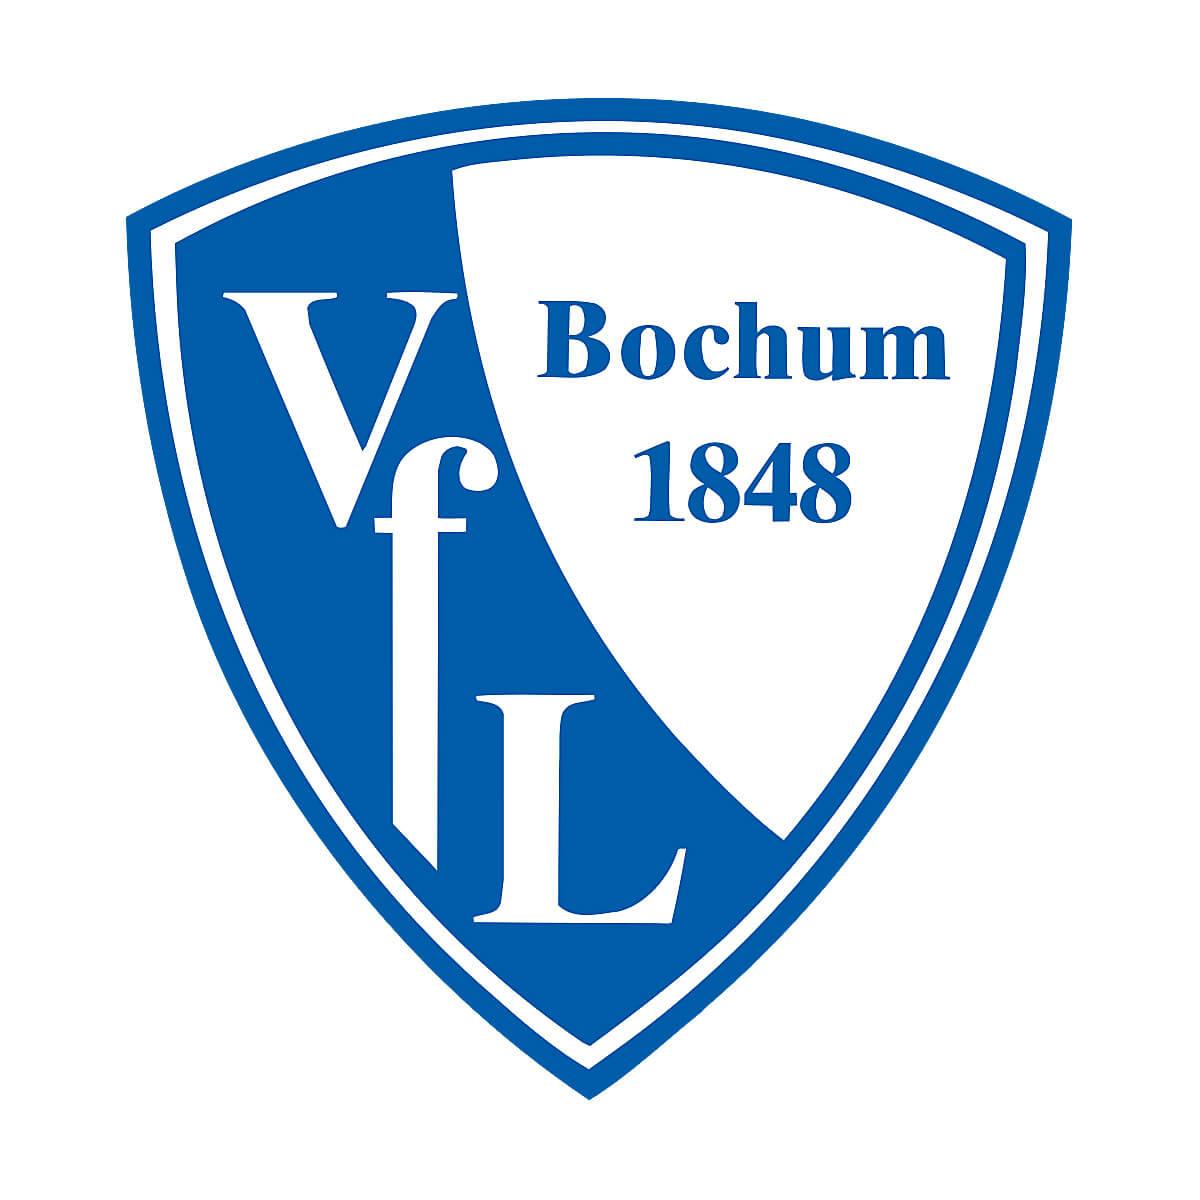 VfL Bochum Fanshop: Offizielles Logo des Fußballvereins VfL Bochum